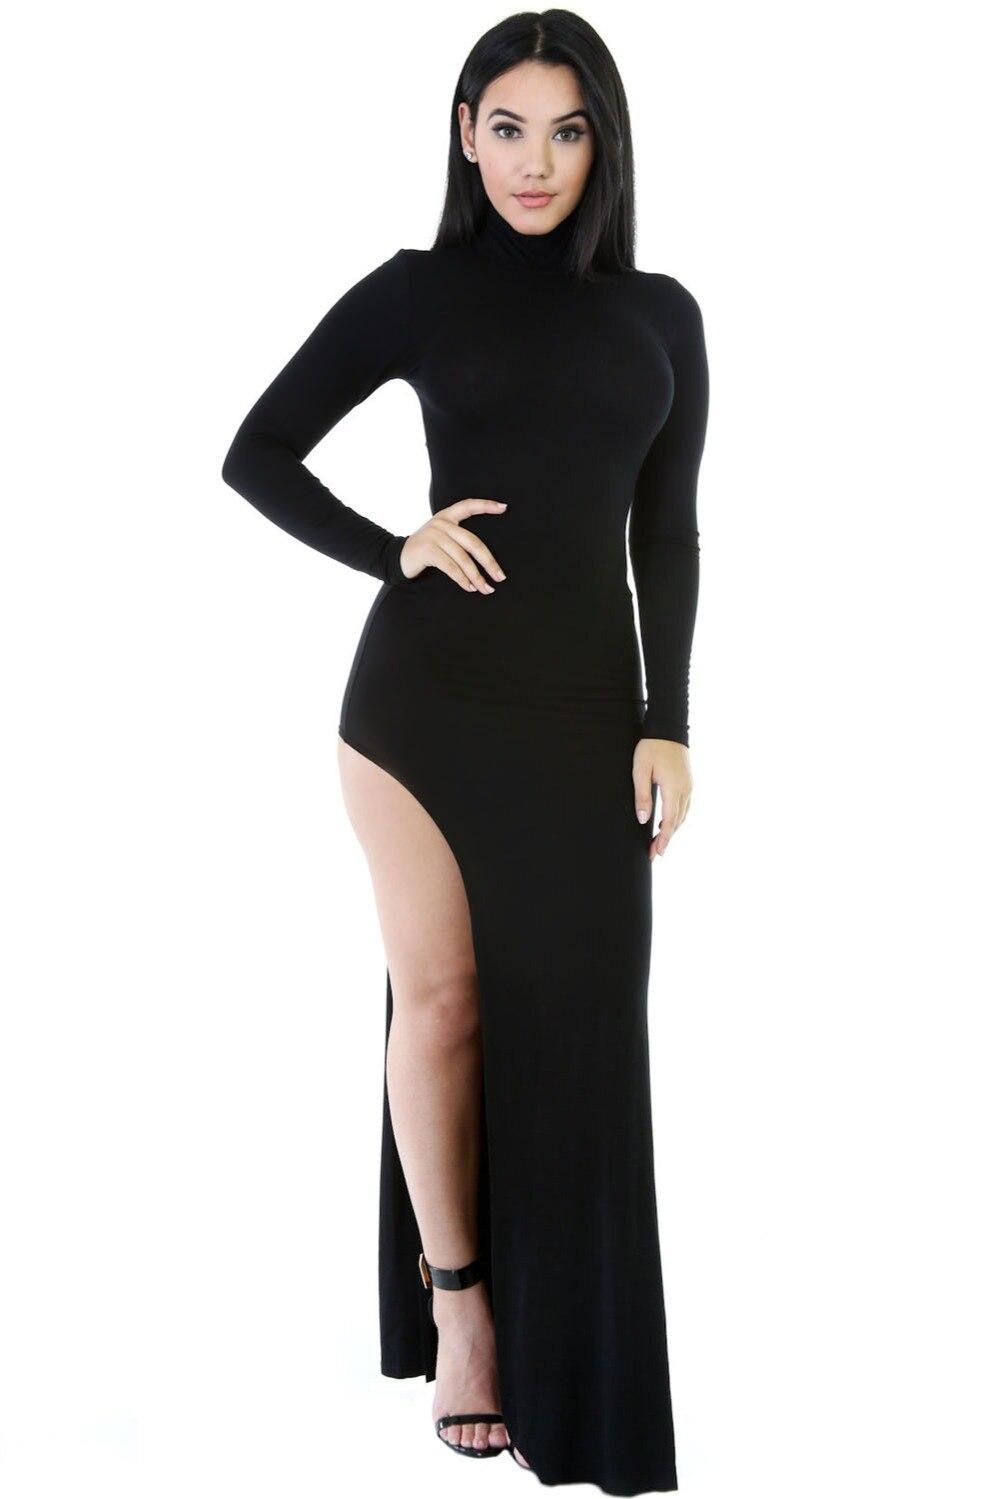 Autumn Turtleneck Side Split Jersey Maxi Dress Women Asymmetrical Black White Long Sleeve Bodyon Party Dresses Vestido Largo